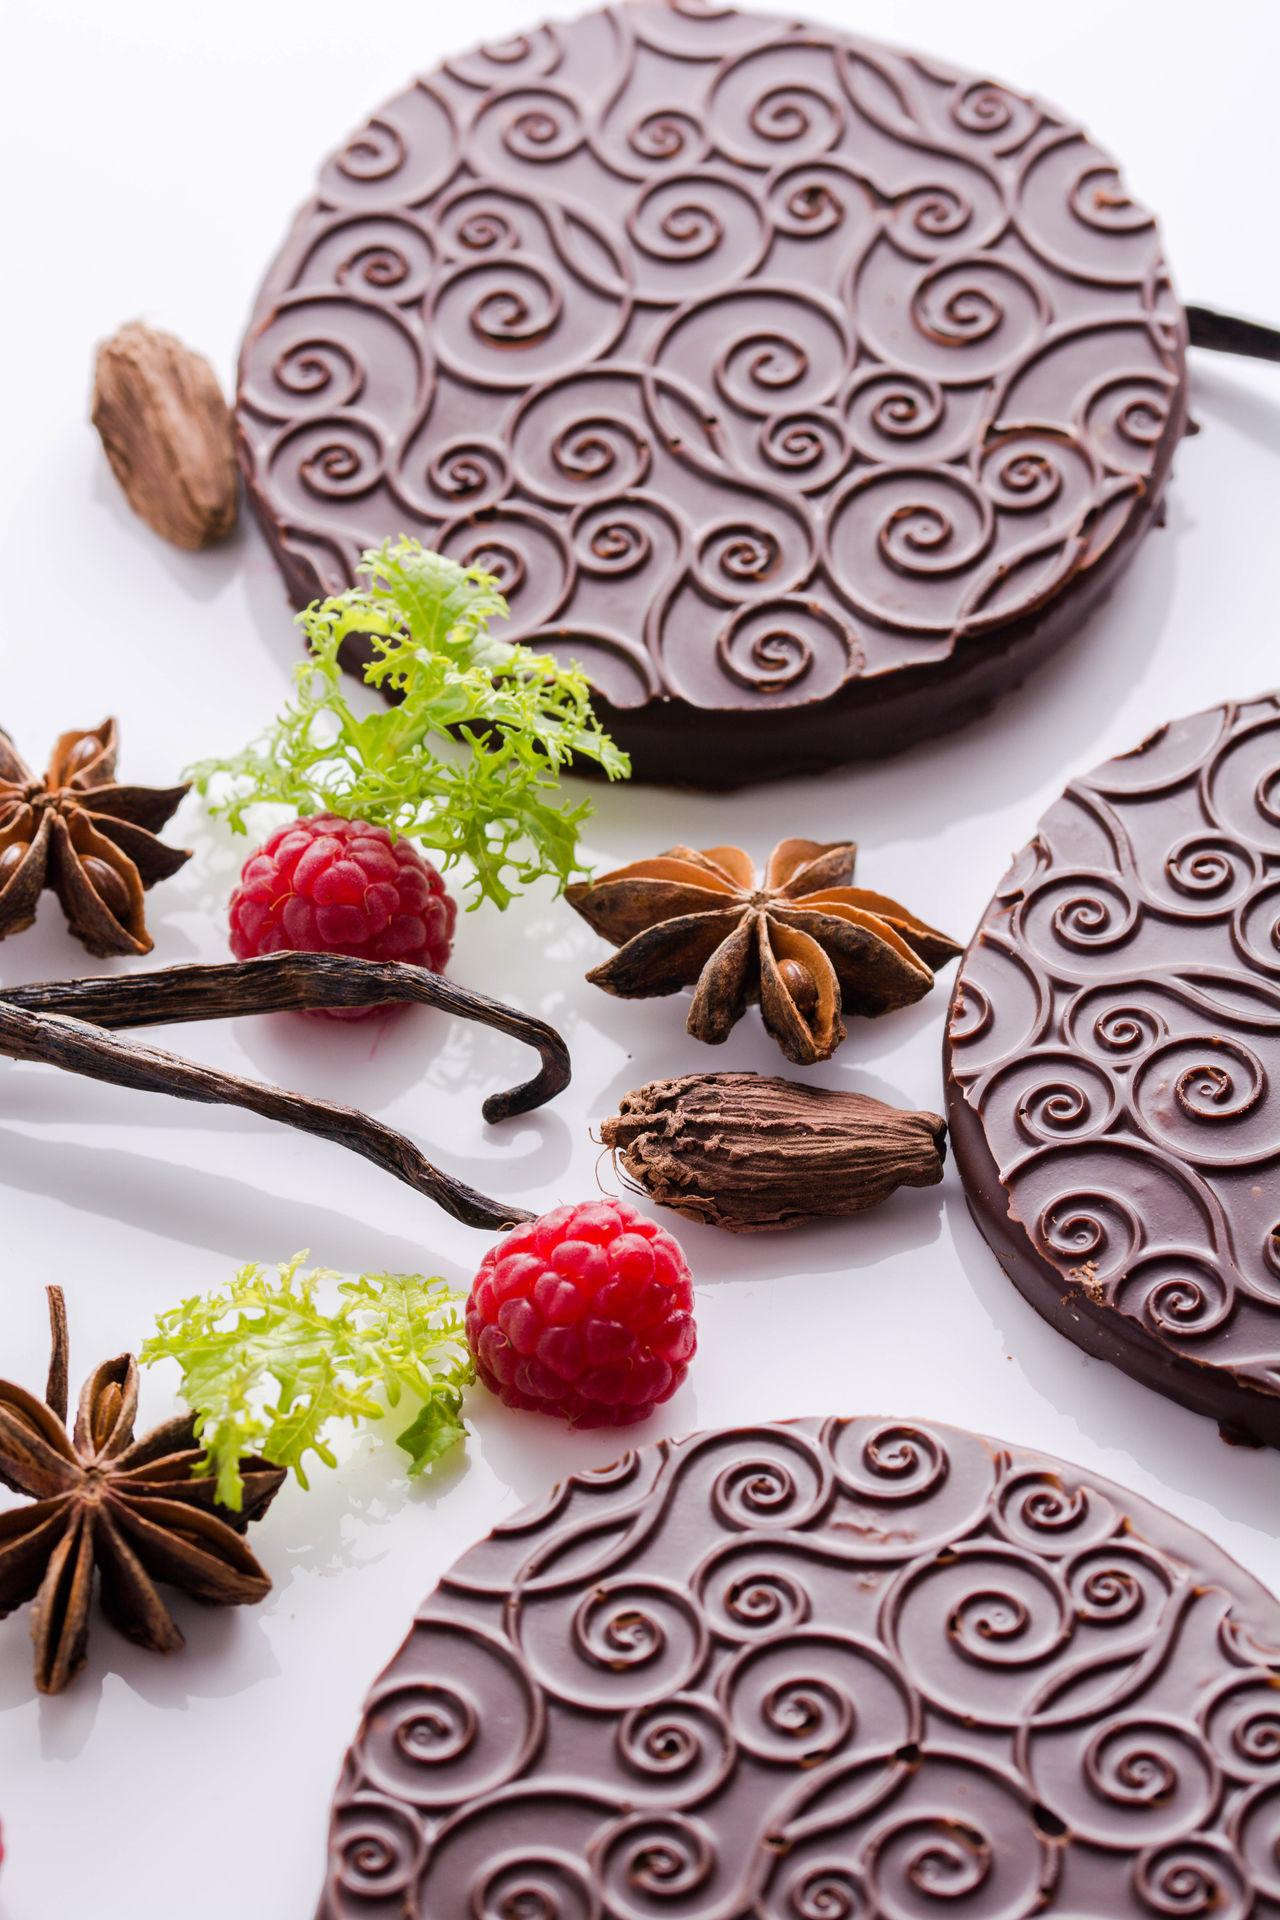 Chokocake Food Linzer No People Staranise Studio Shoot